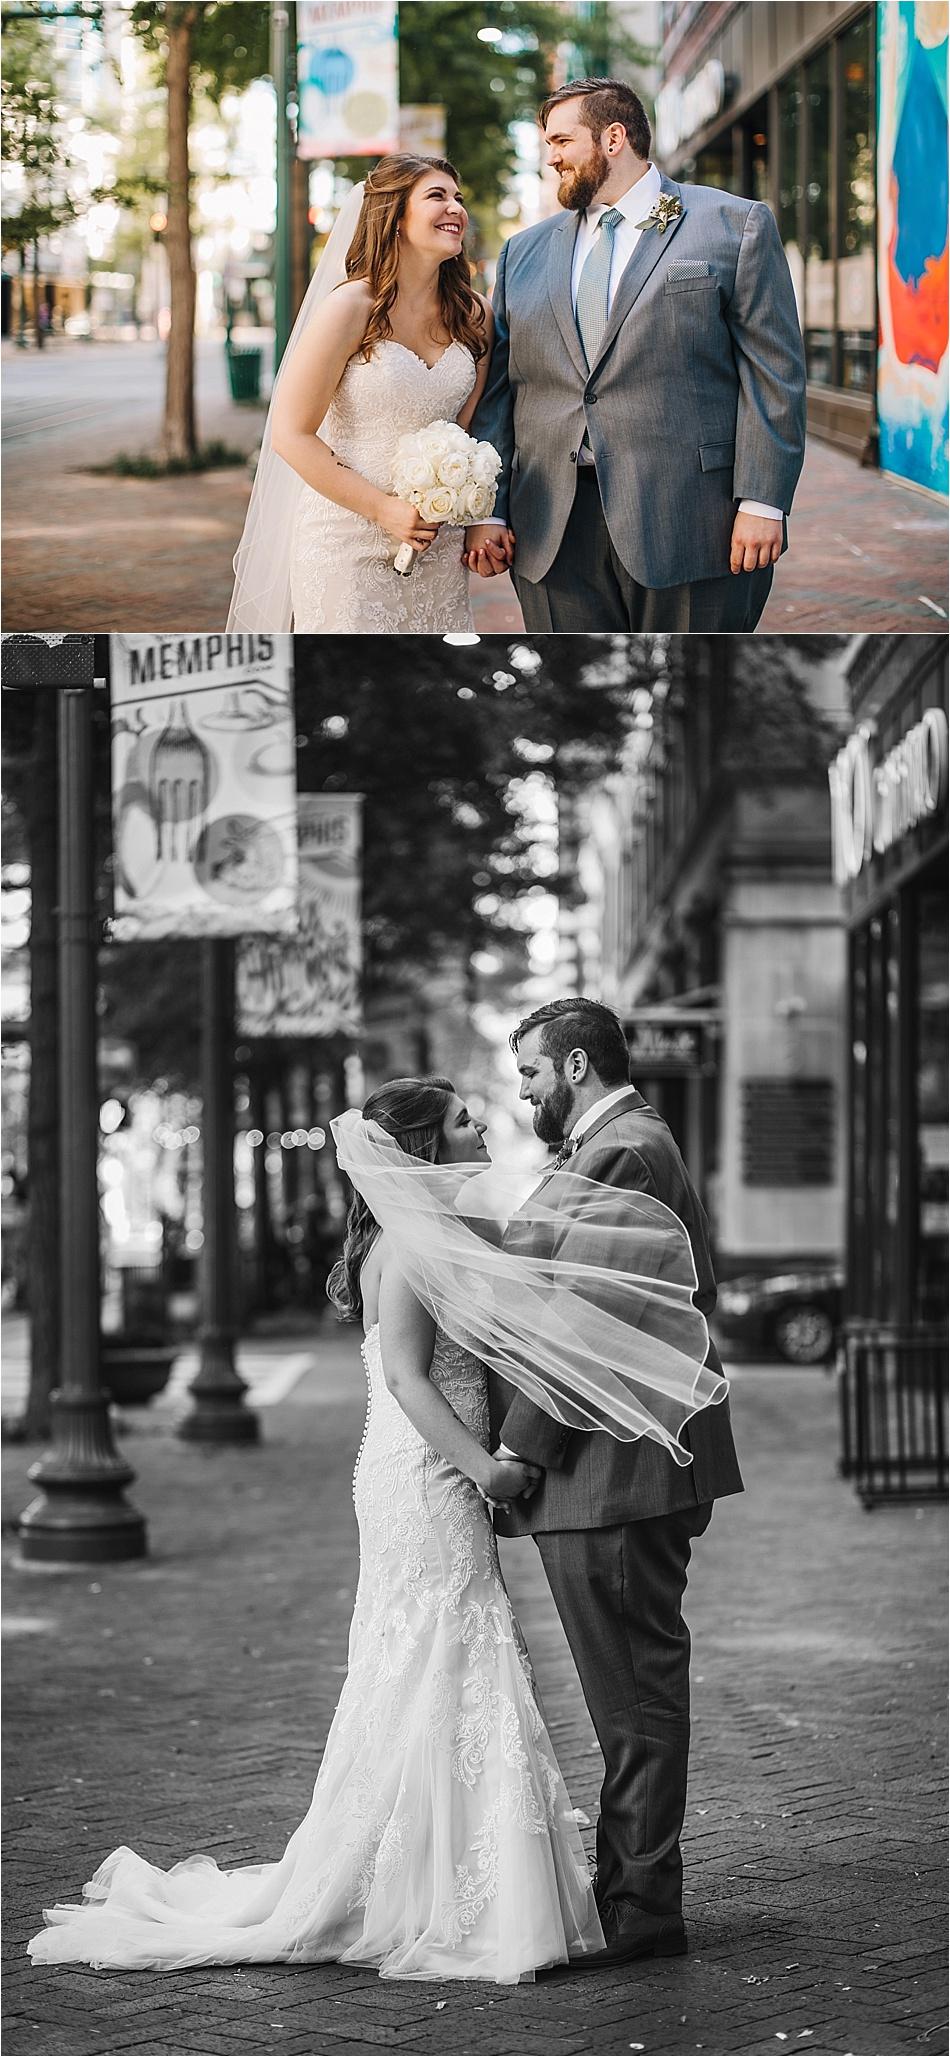 CK-Photo-Nashville-Wedding-Photographer-_0015.jpg